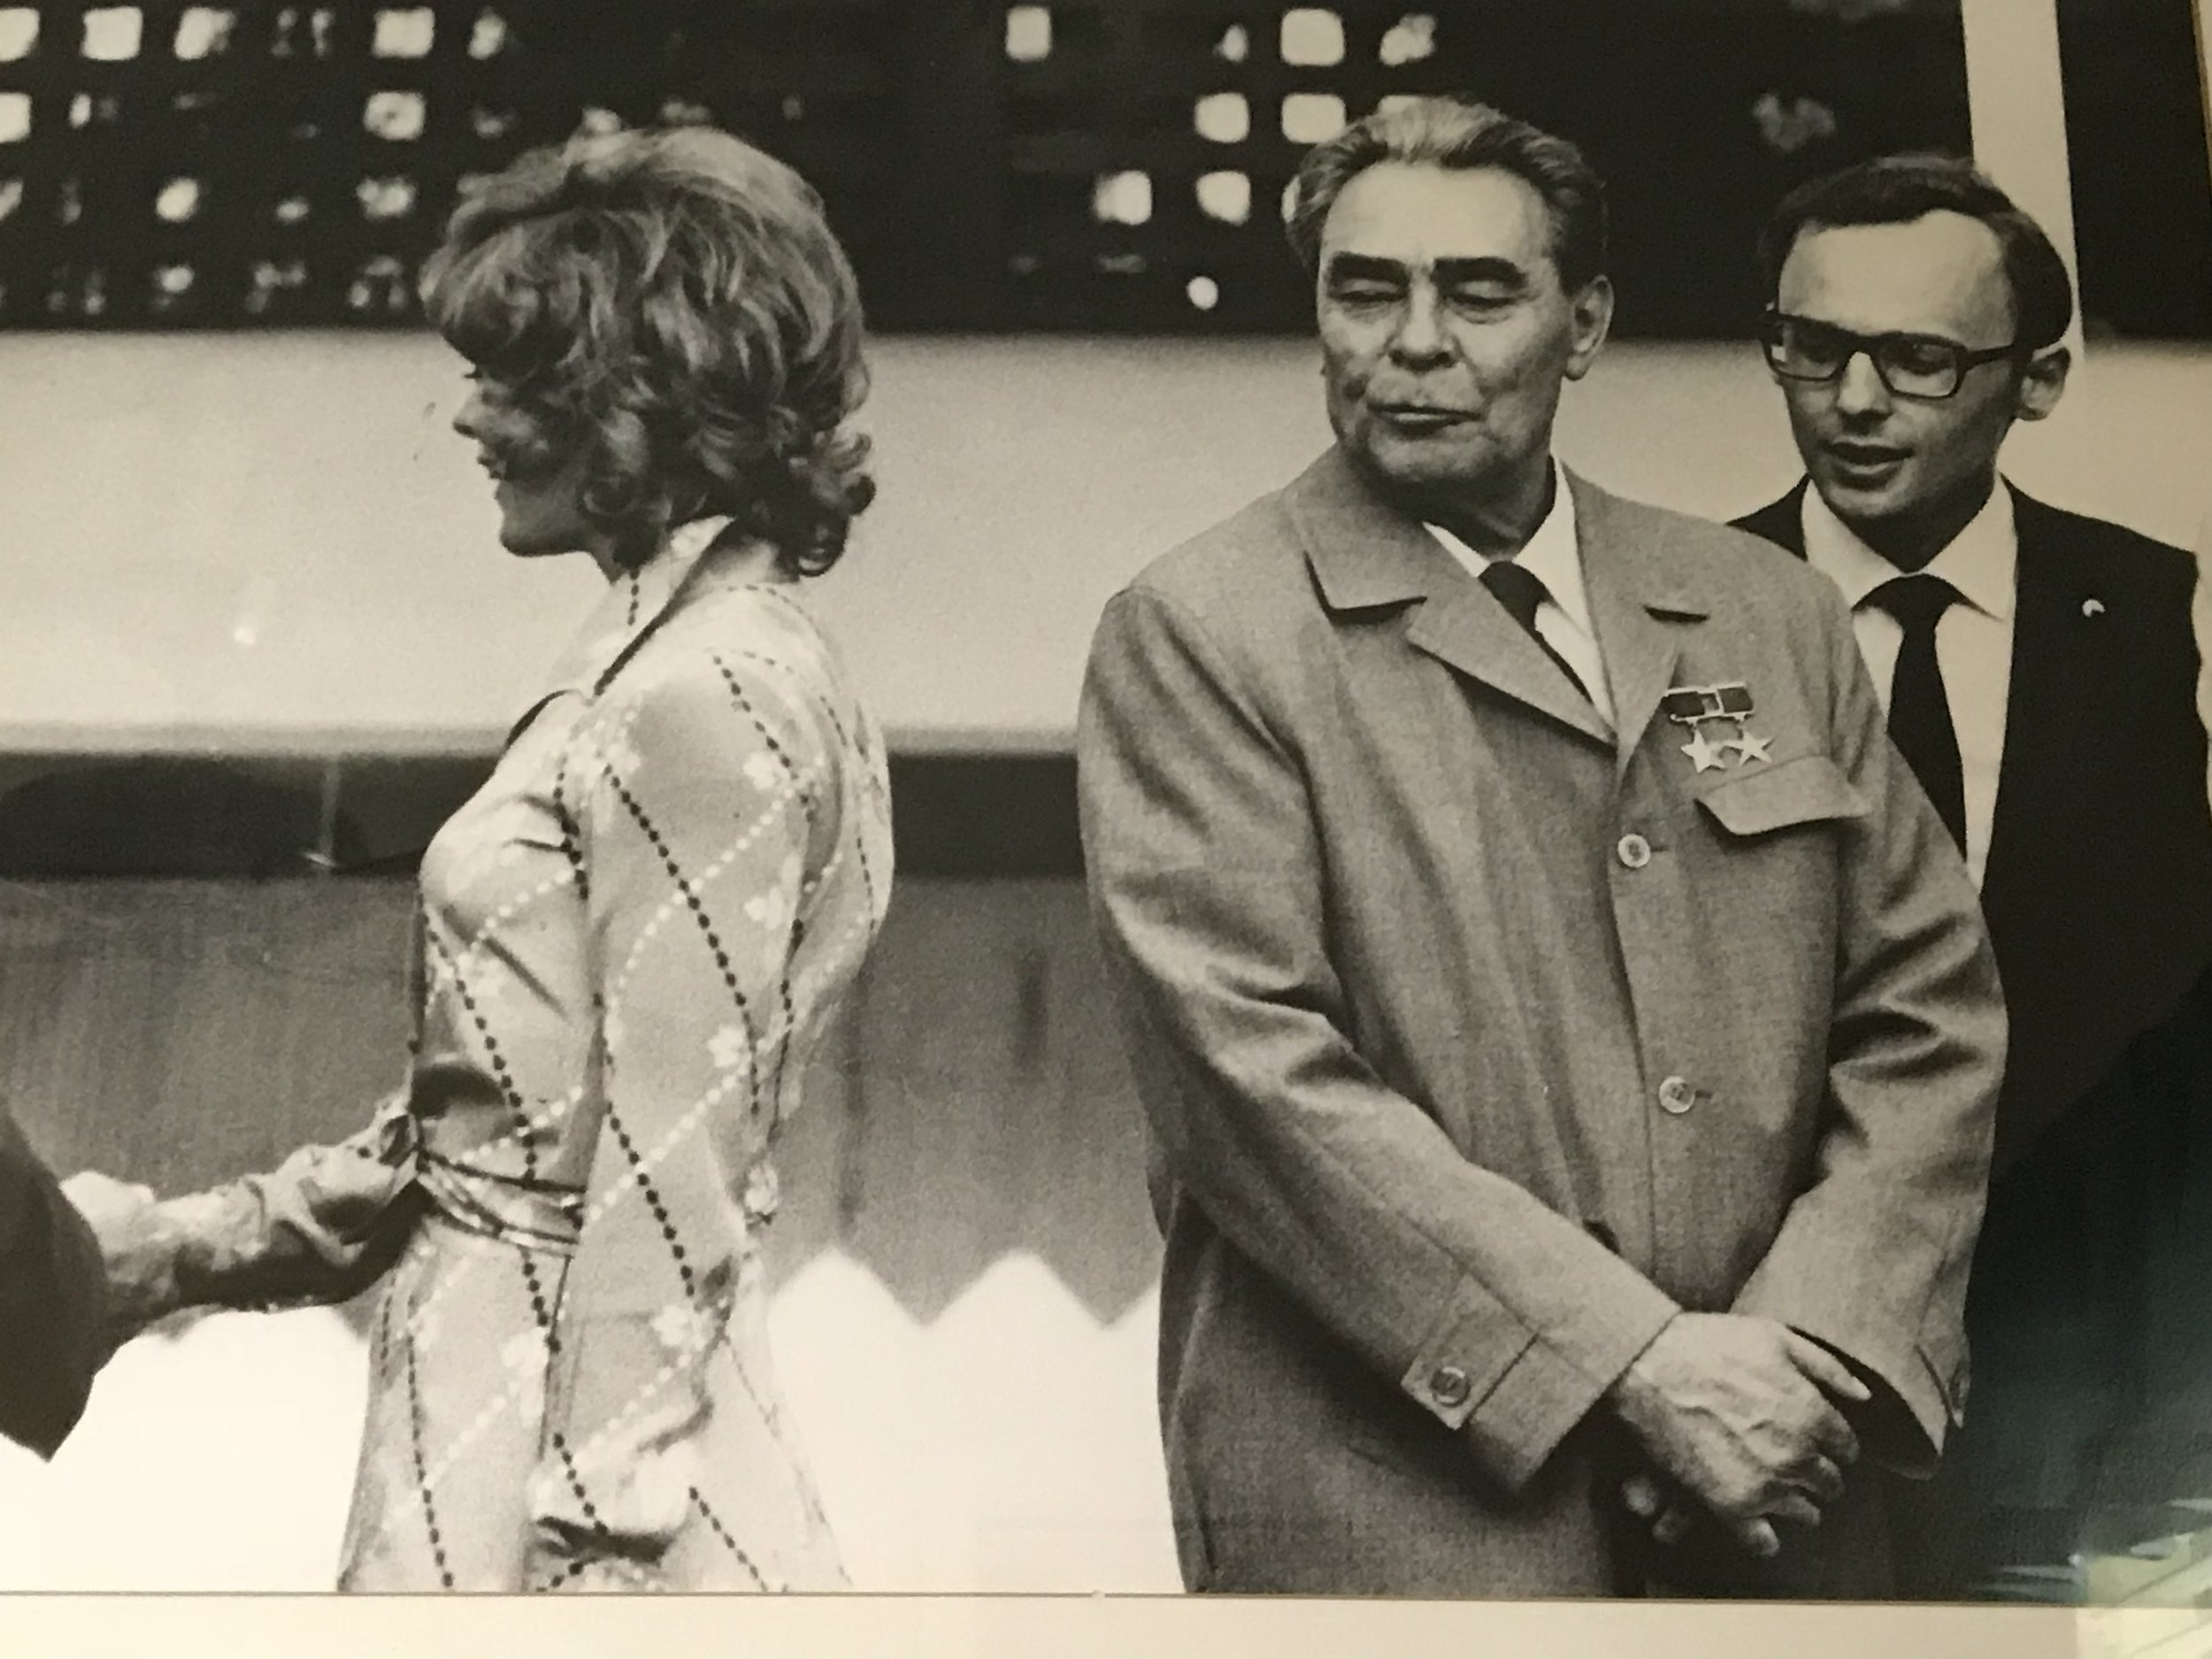 Russian President Leonid Brezhnev ogles actress Jill St. John at a Washington DC function. Copyright: Wally McNamee